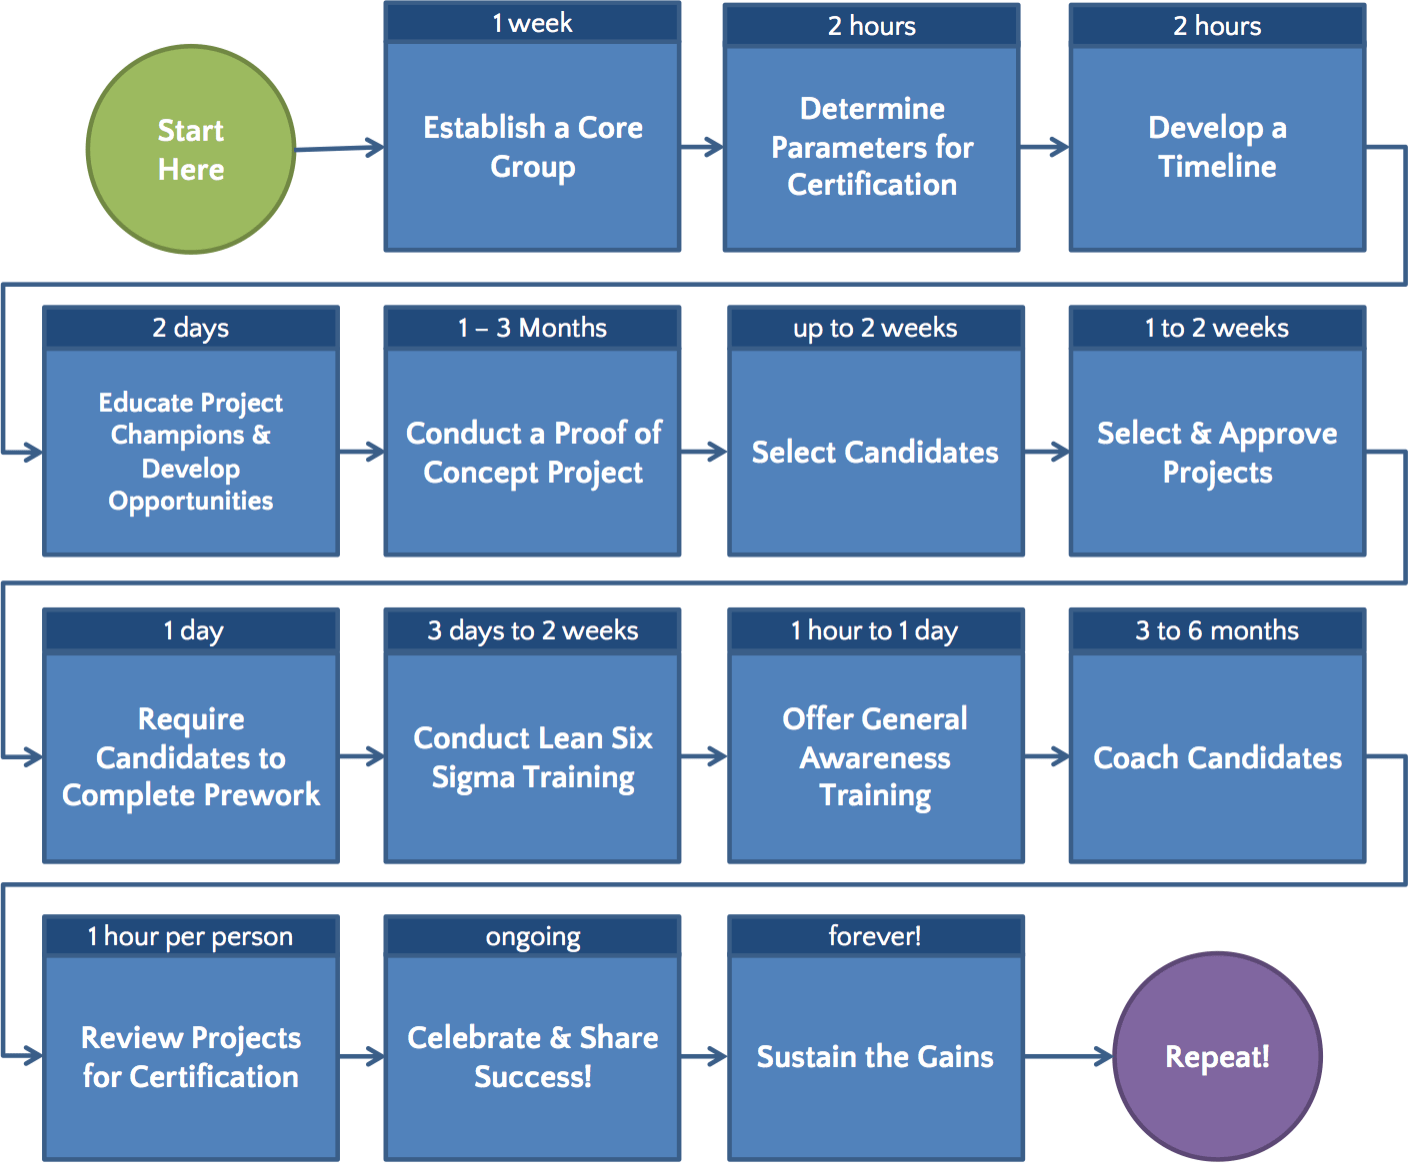 RK1_Develop-Timeline_GoLeanSixSigma.com